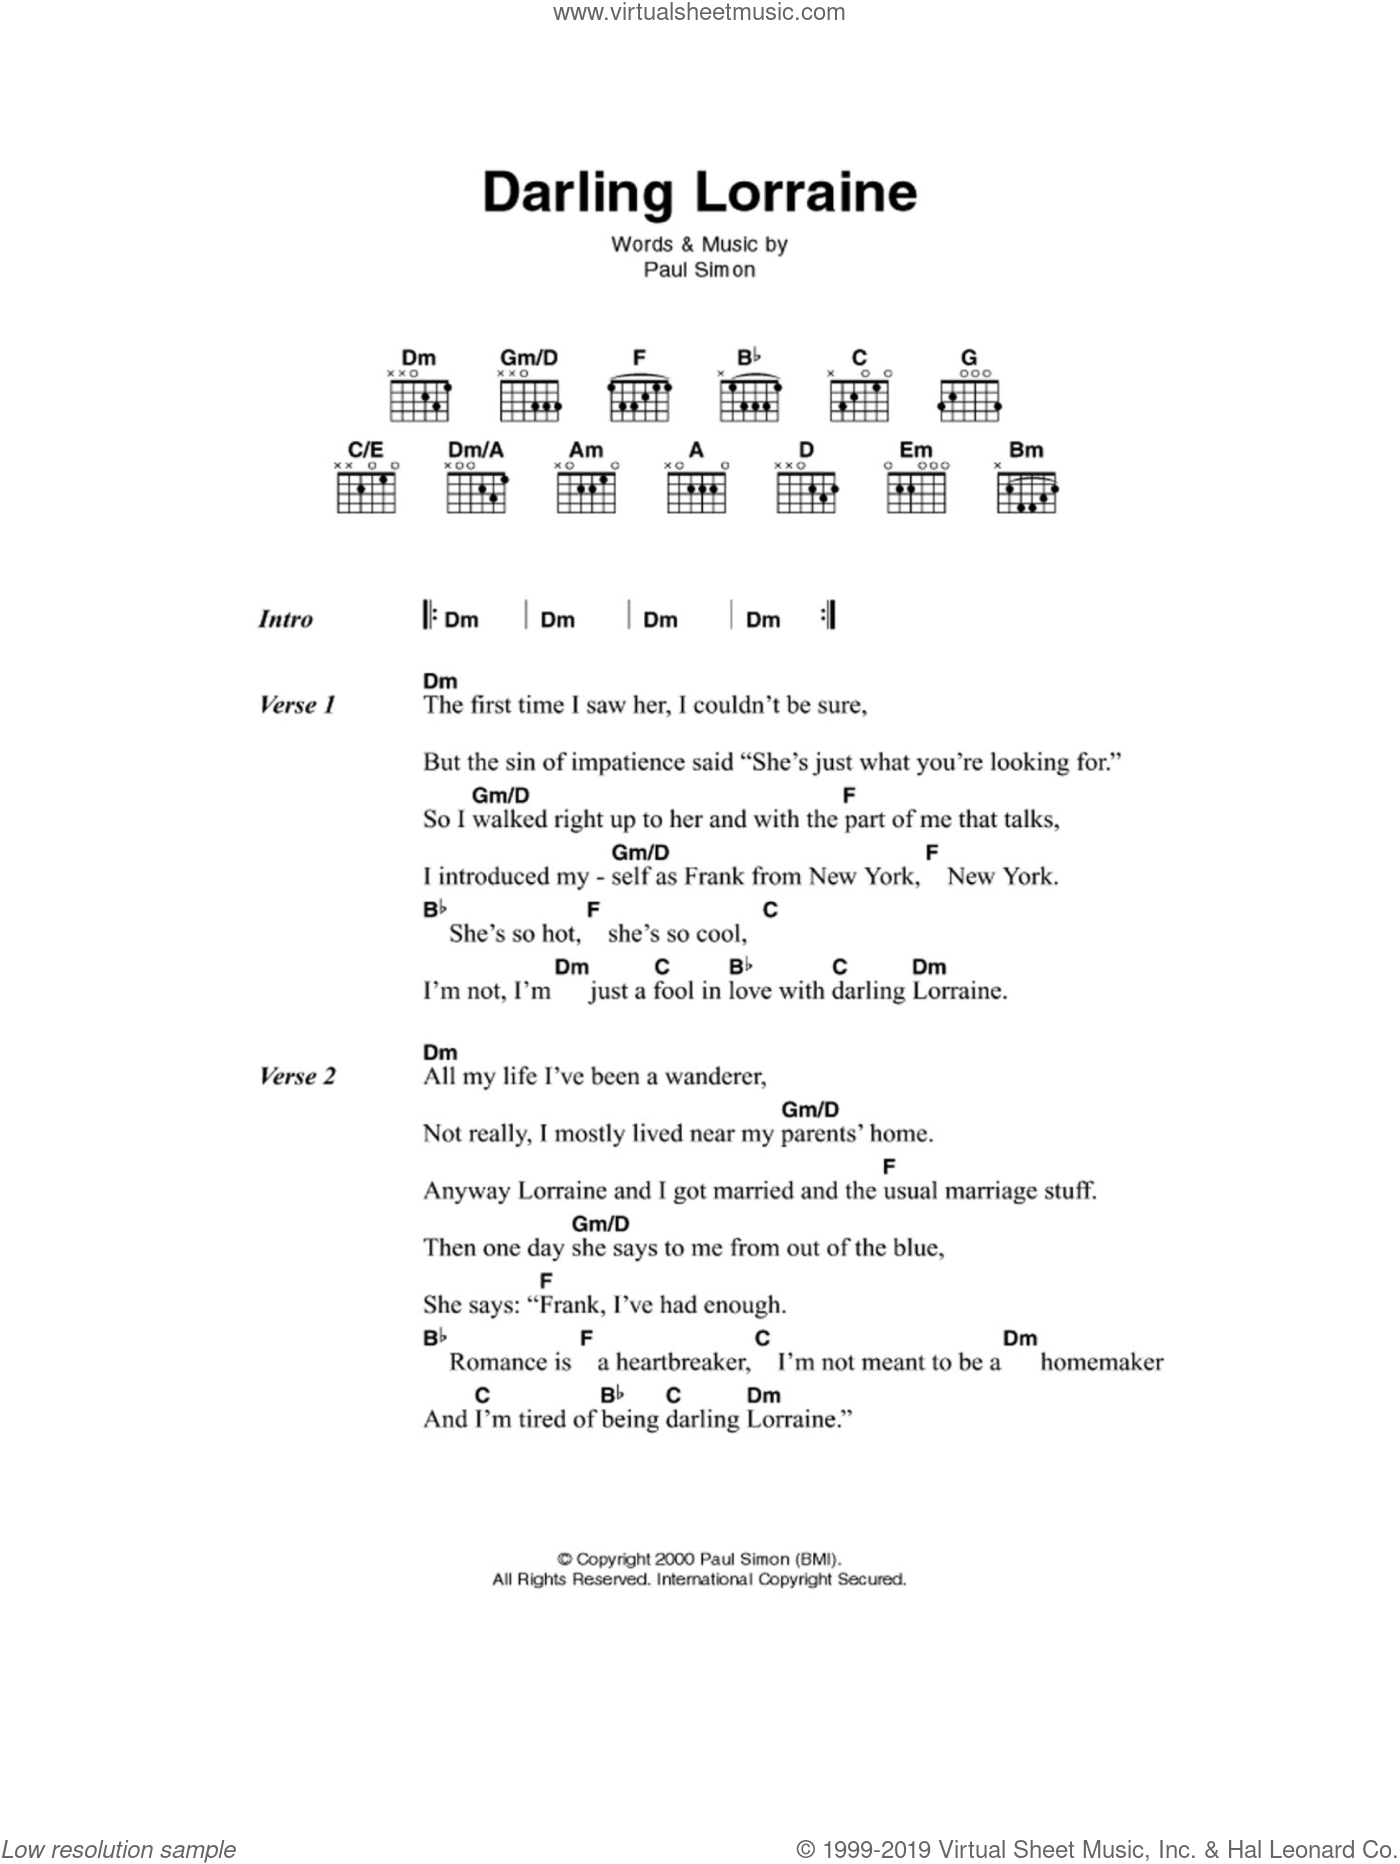 Simon - Darling Lorraine sheet music for guitar (chords) [PDF]